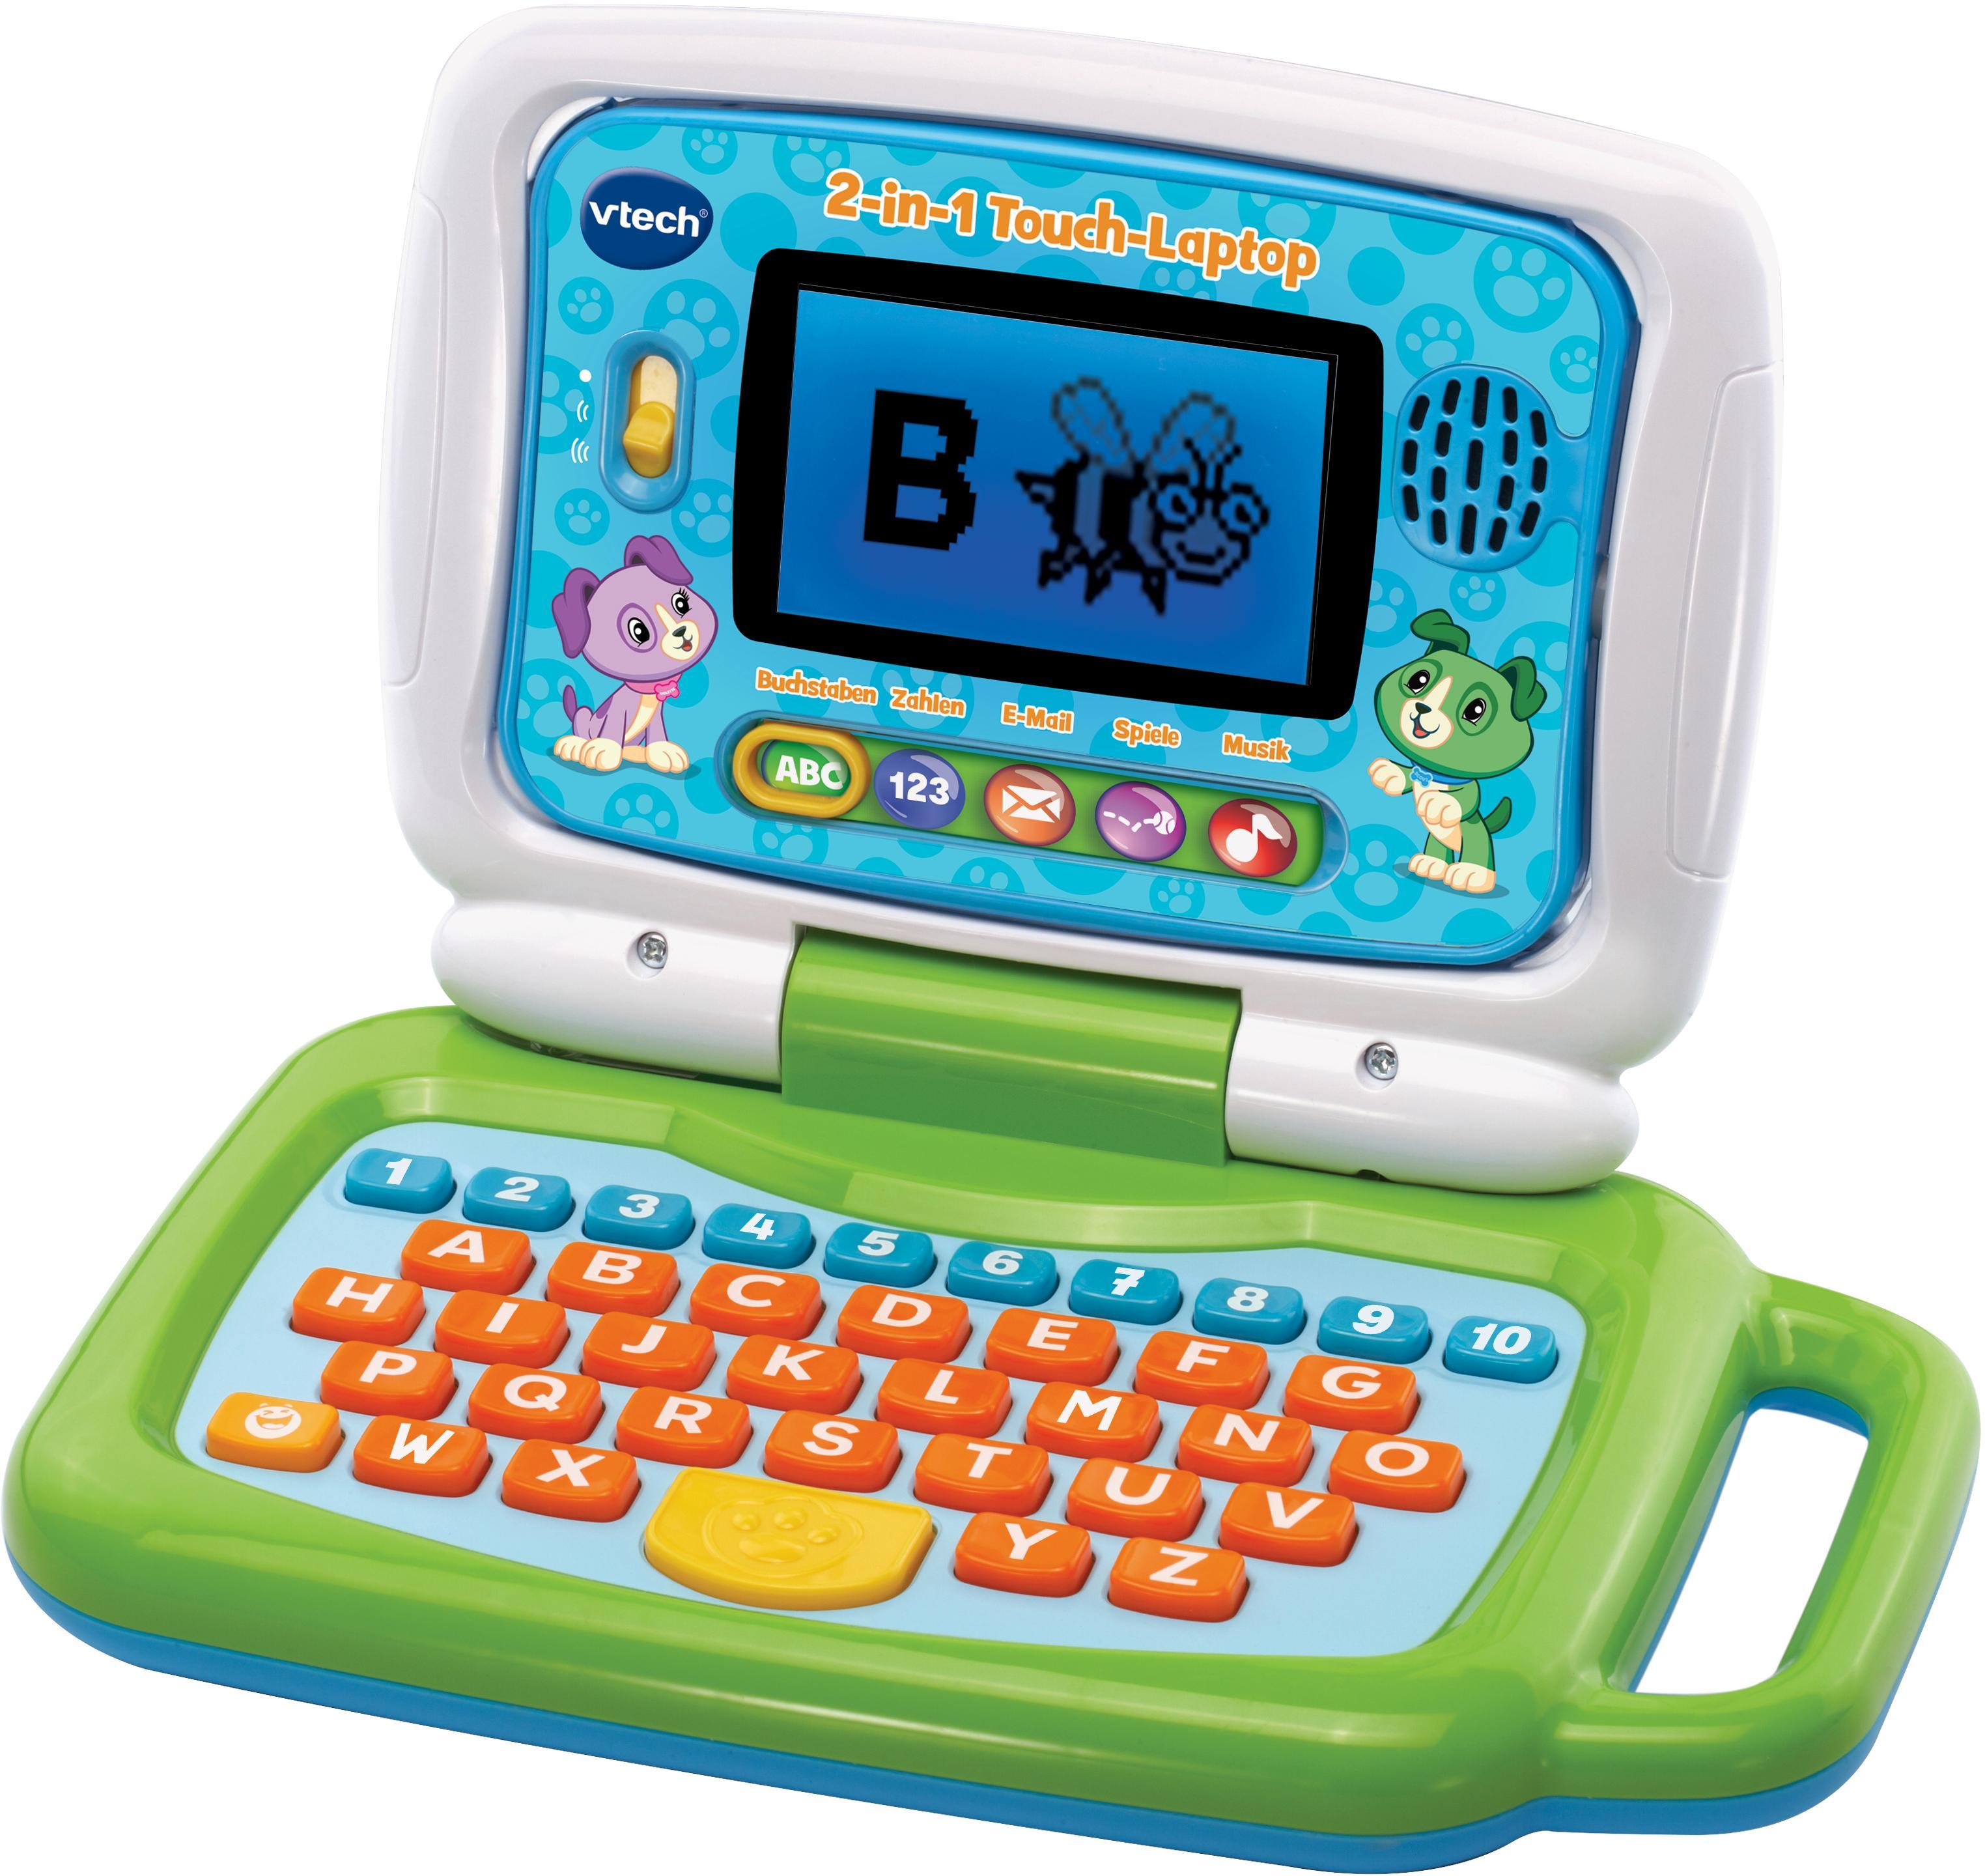 Vtech Kindercomputer 2-in-1 Touch-Laptop bunt Kinder Kinder-Computer Lernspielzeug